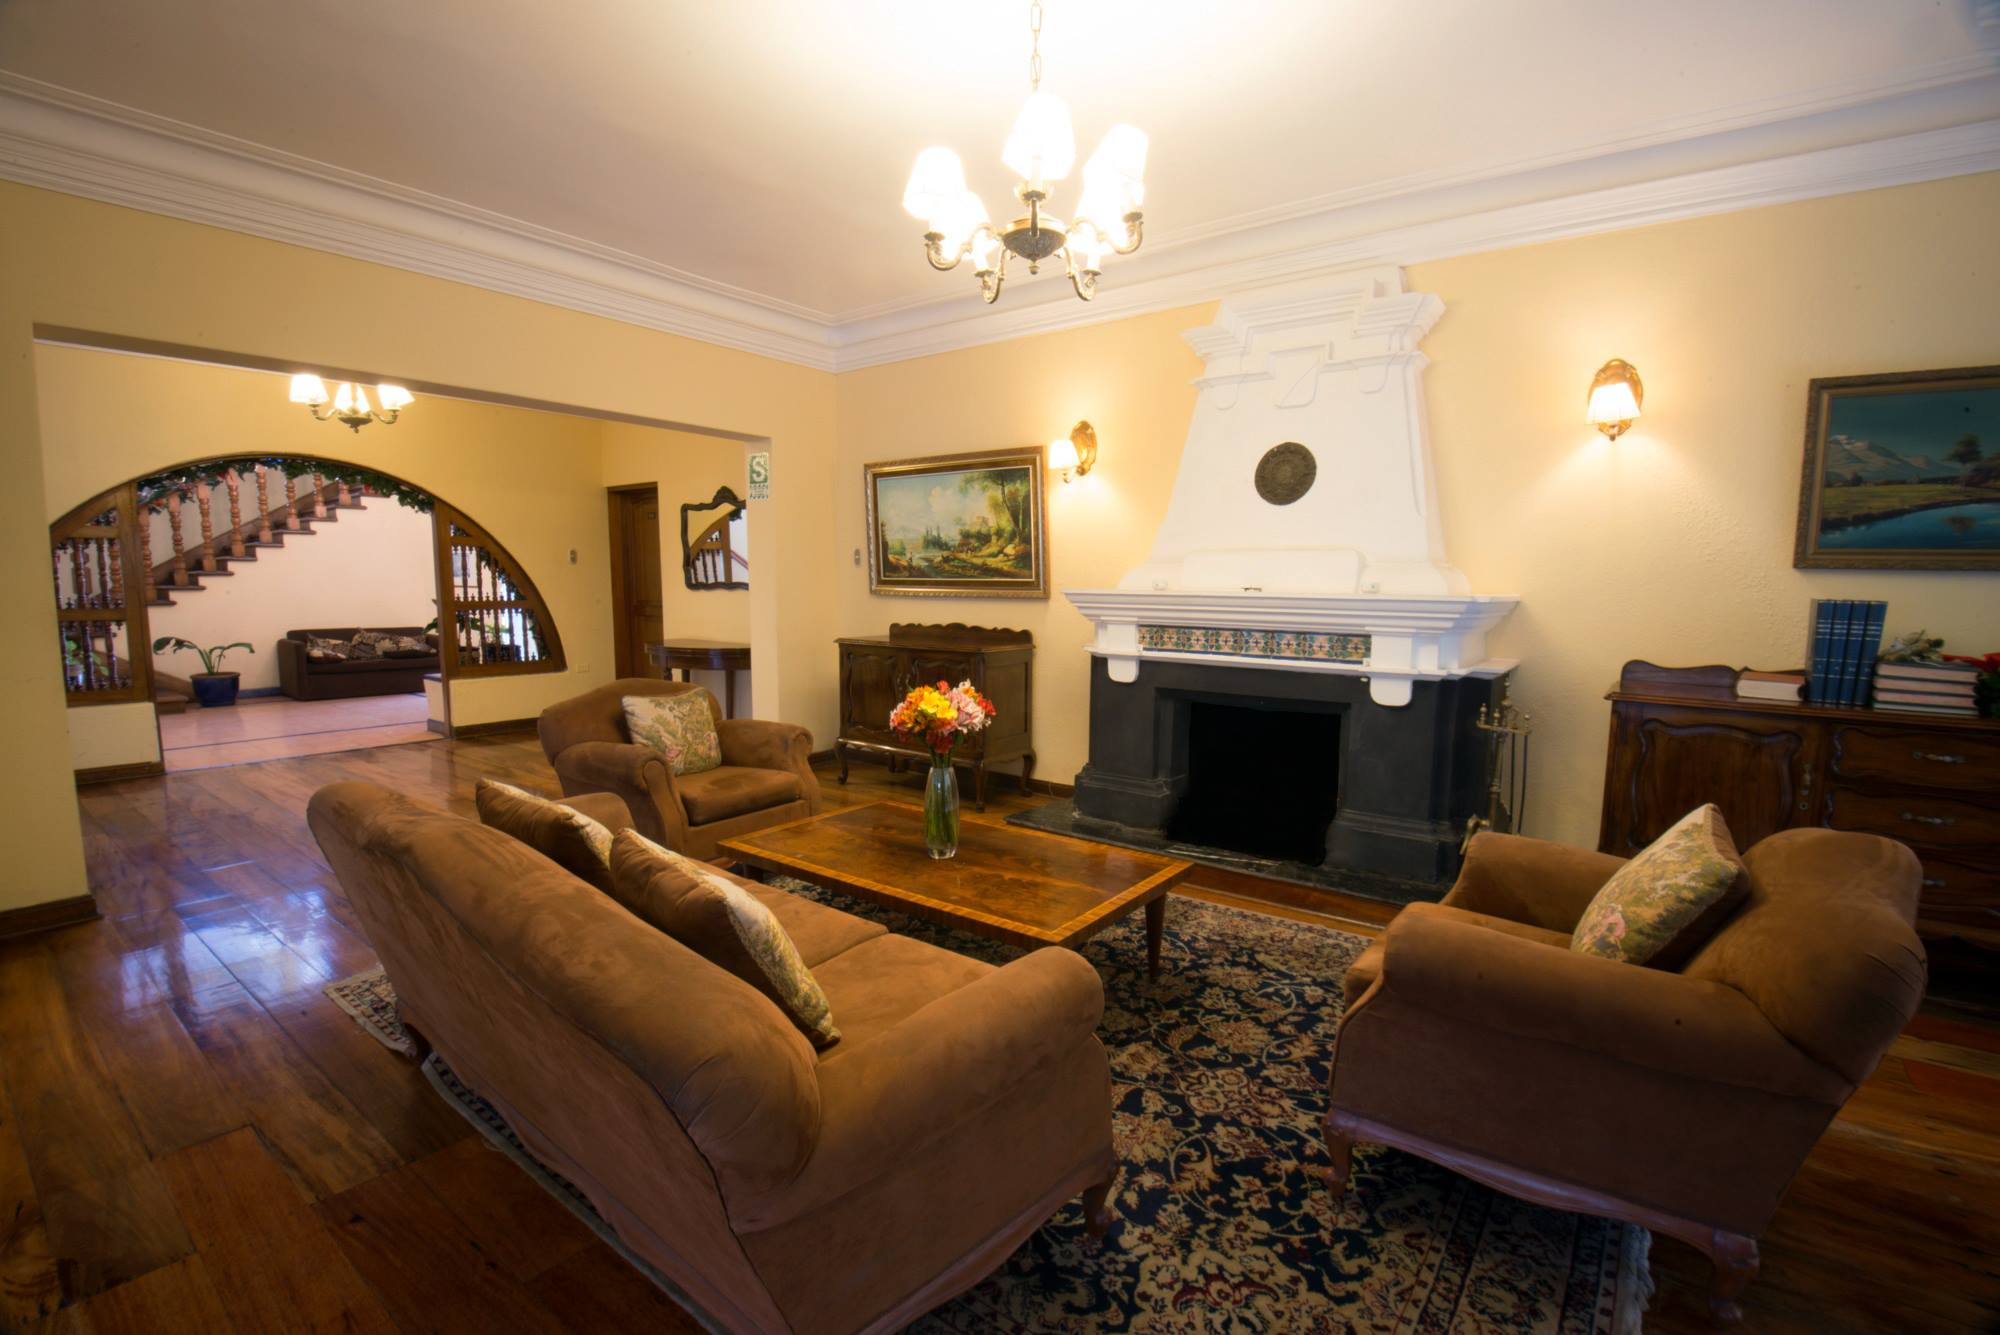 Hotel San Antonio Abad - Internal Lounge